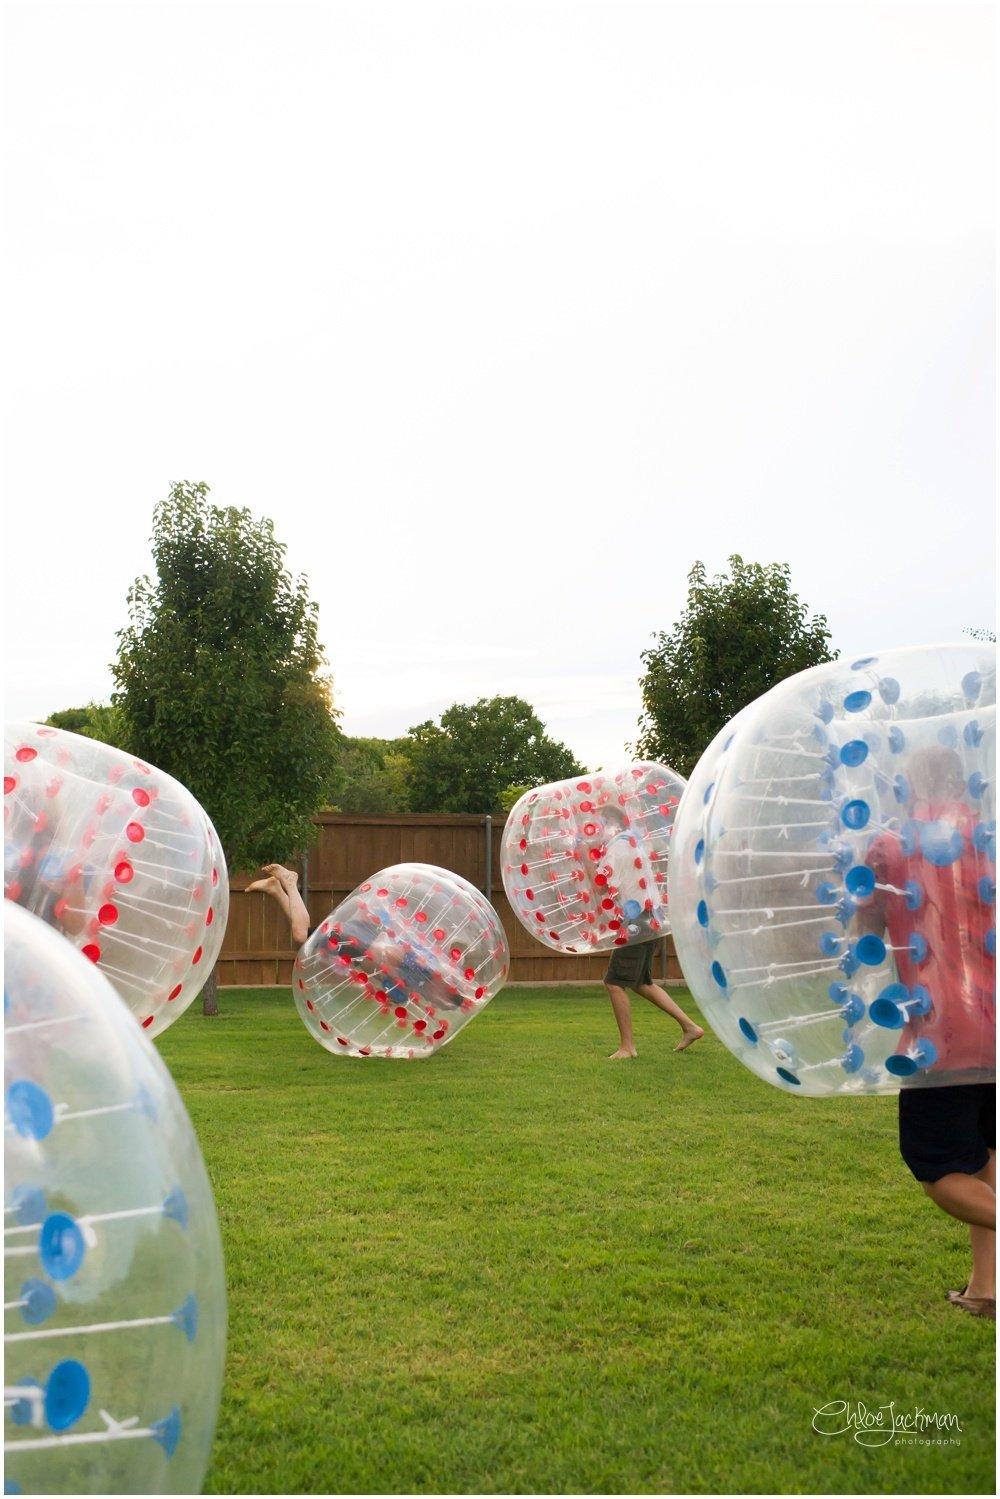 human soccer ball